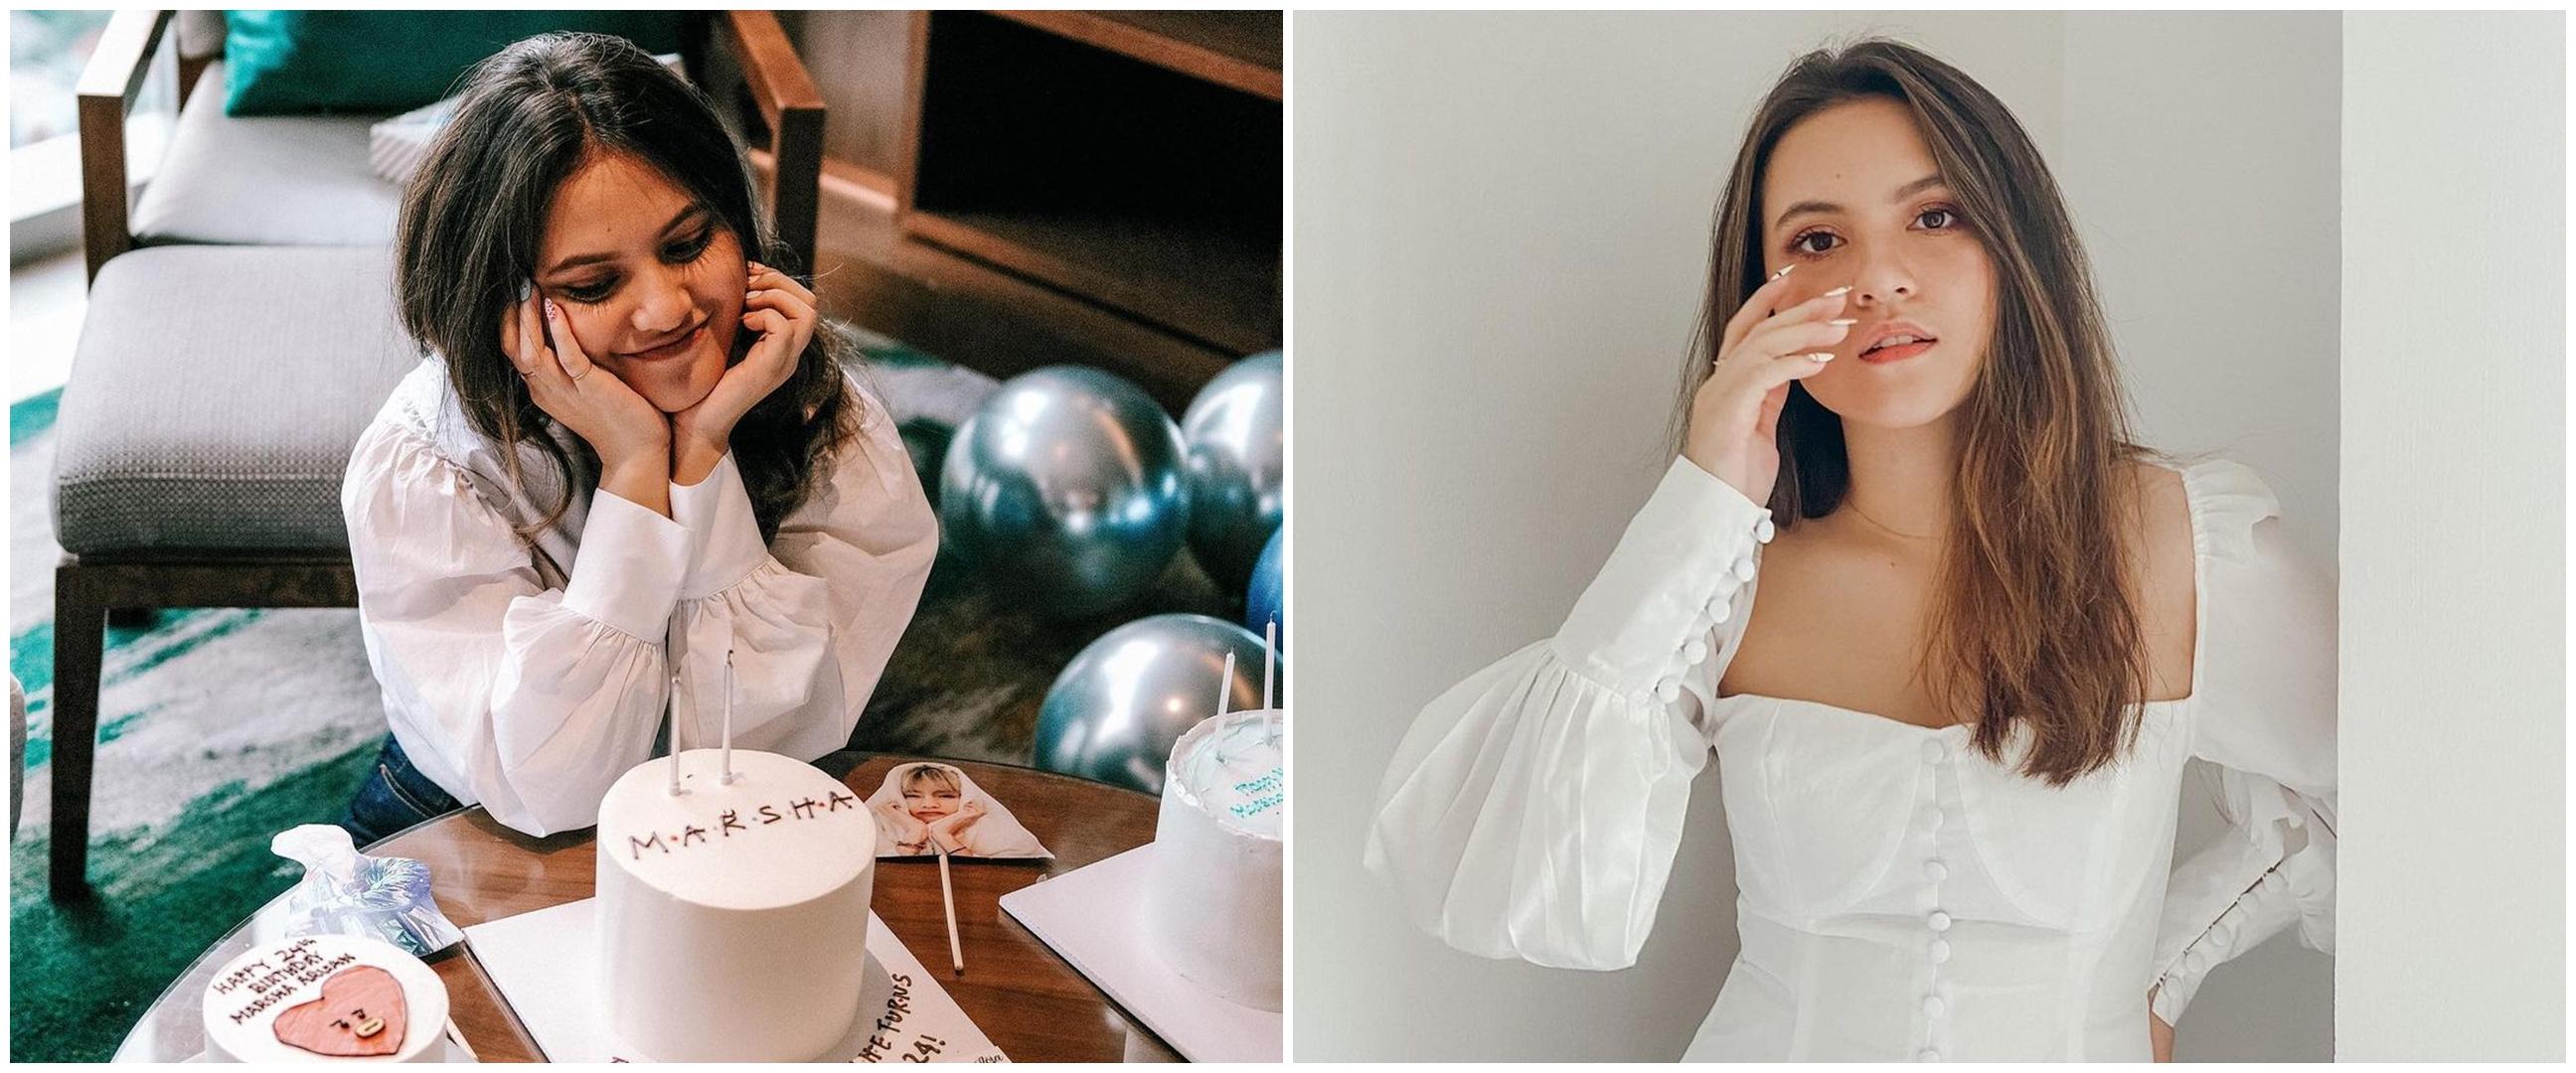 10 Momen kejutan ulang tahun Marsha Aruan ke-24, ada pernak pernik BTS